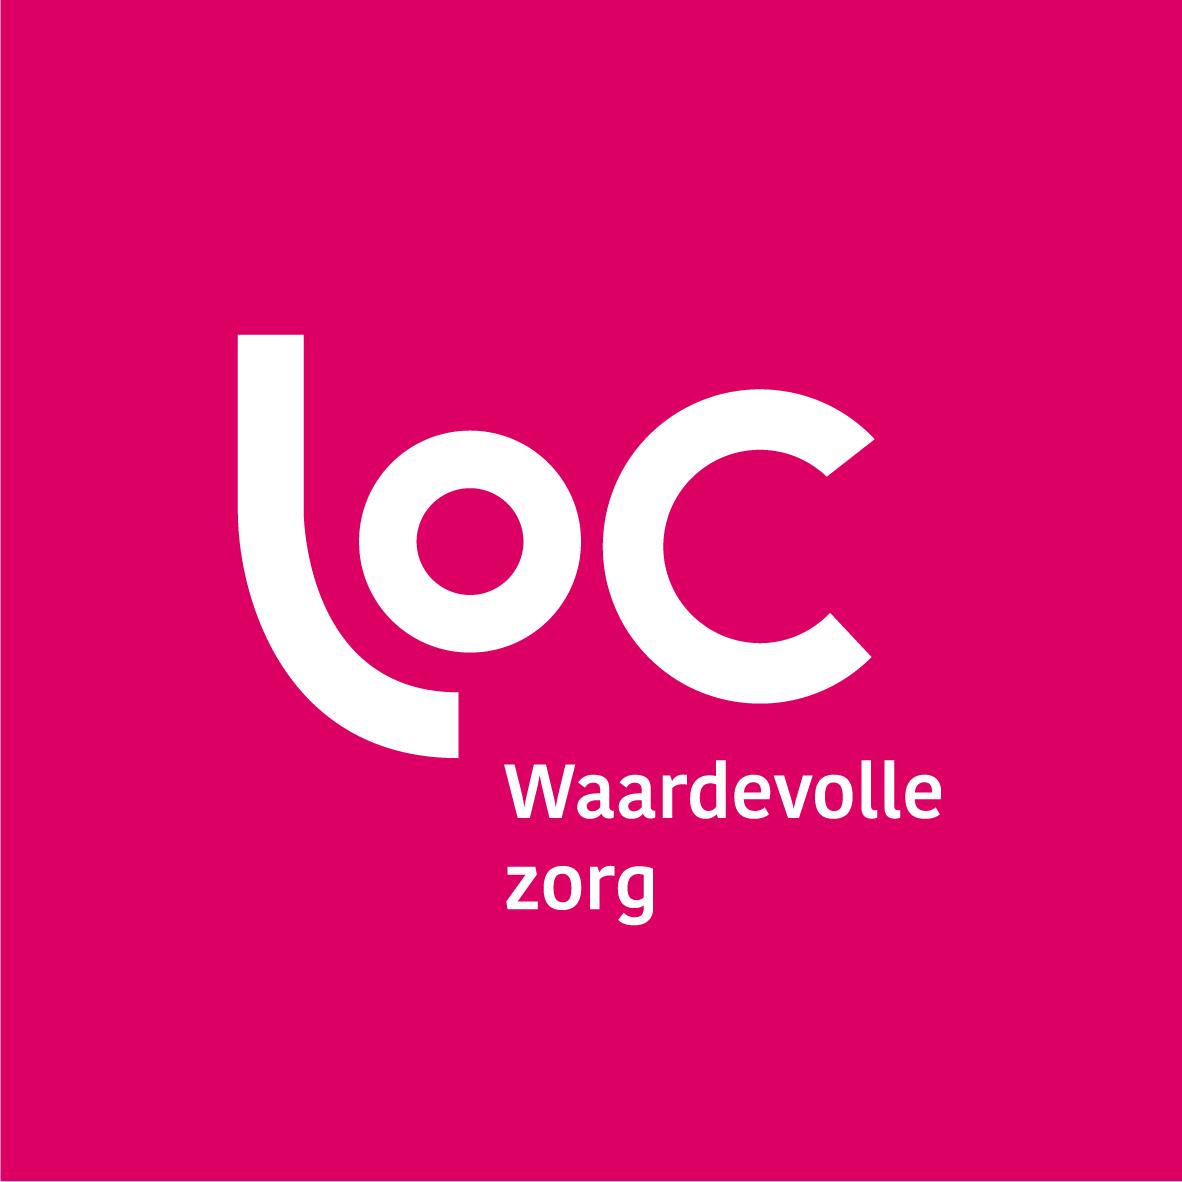 LOC Waardevolle zorg Logo